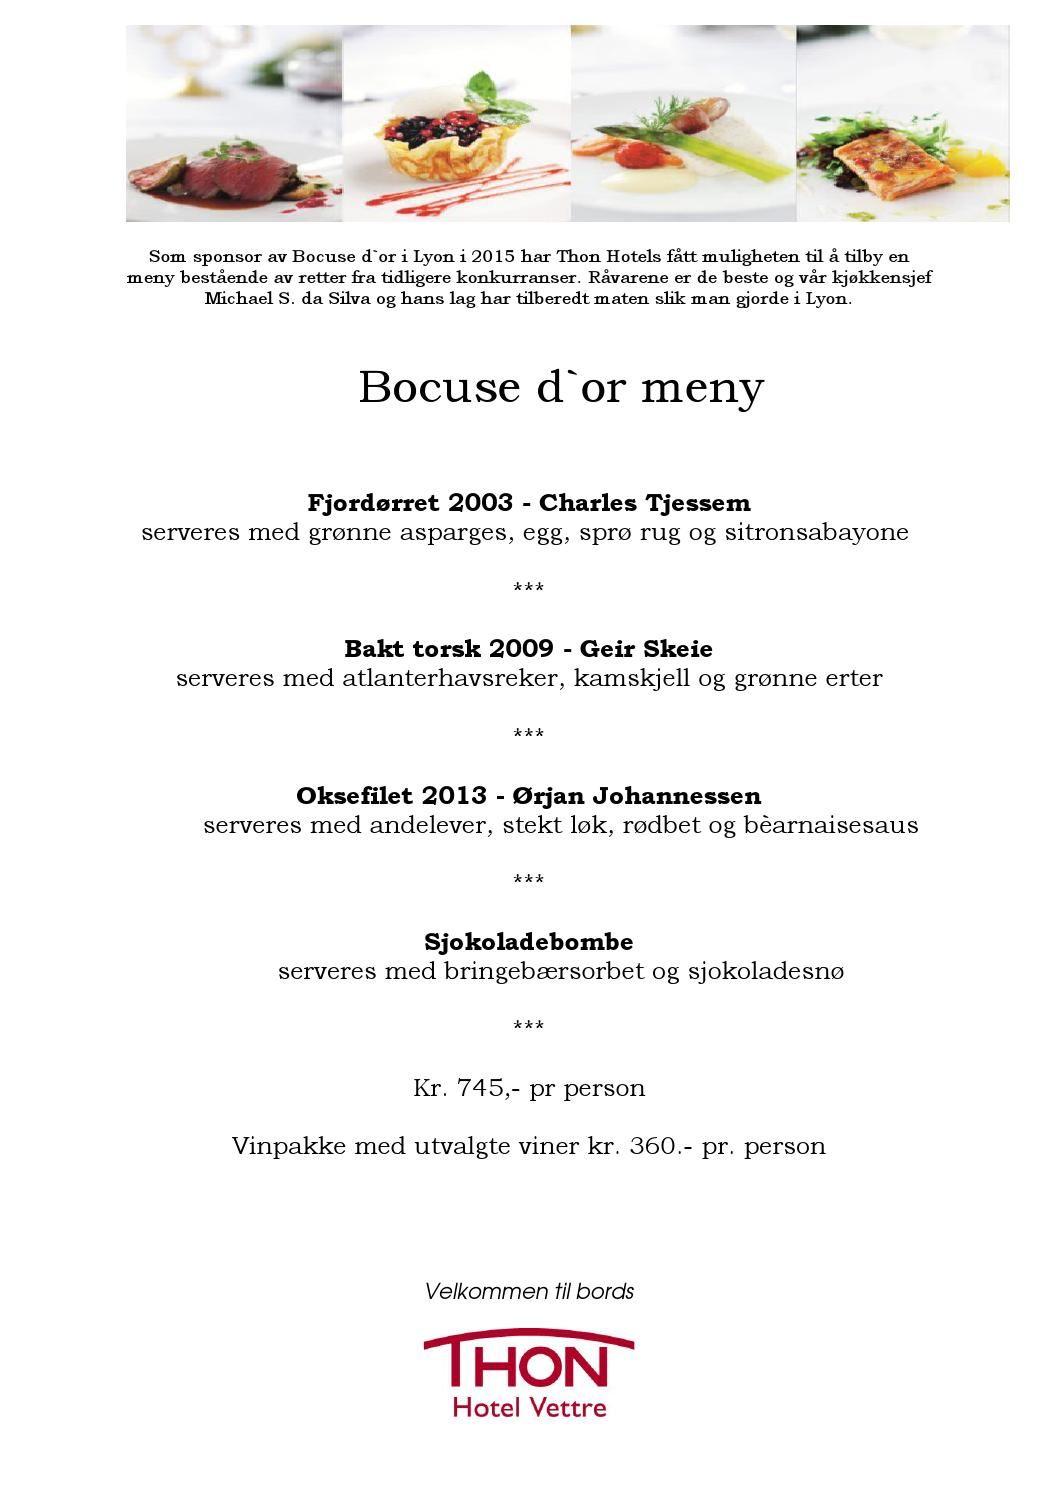 Thon Hotel Vettre - Bocuse d'or meny